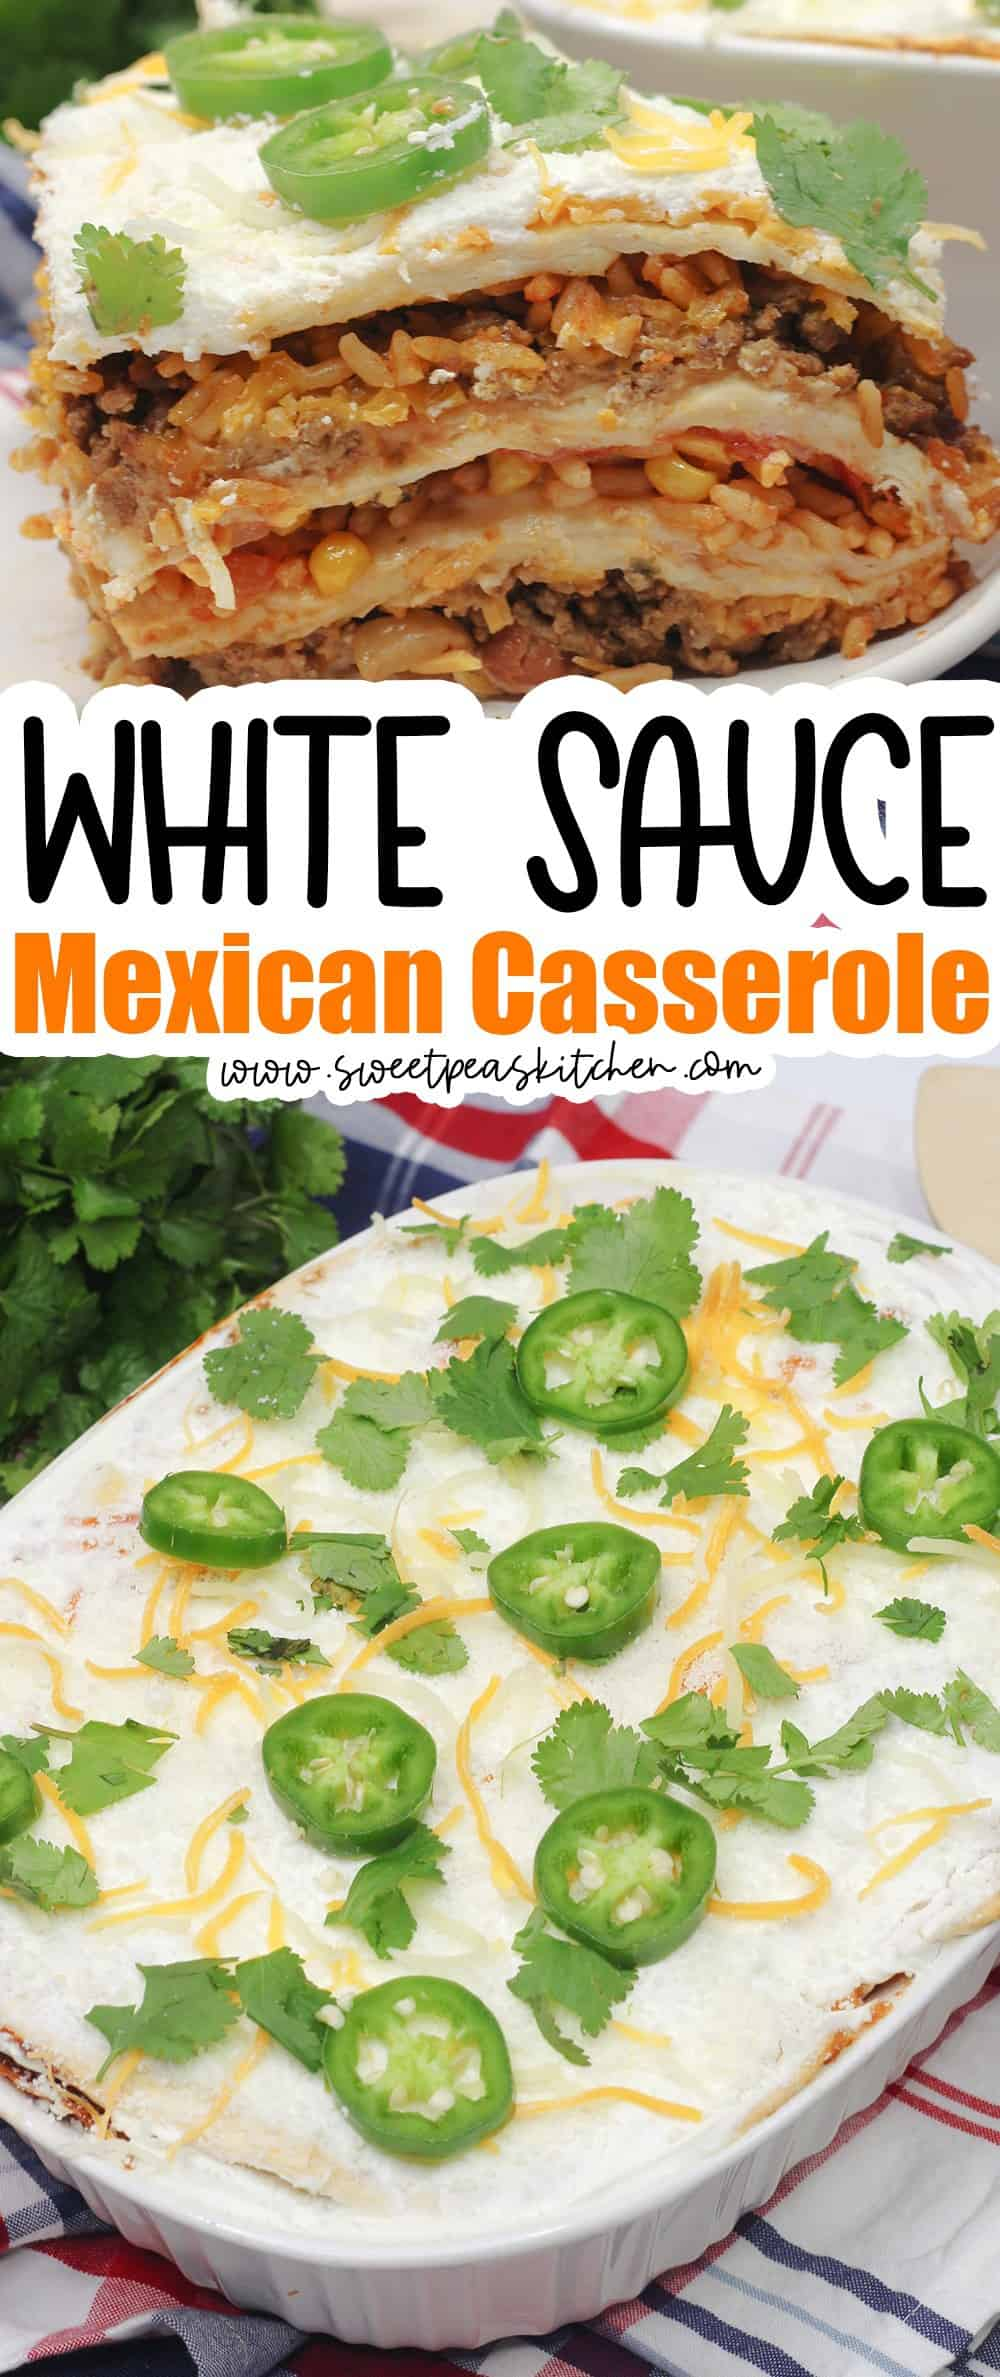 White Sauce Mexican Casserole